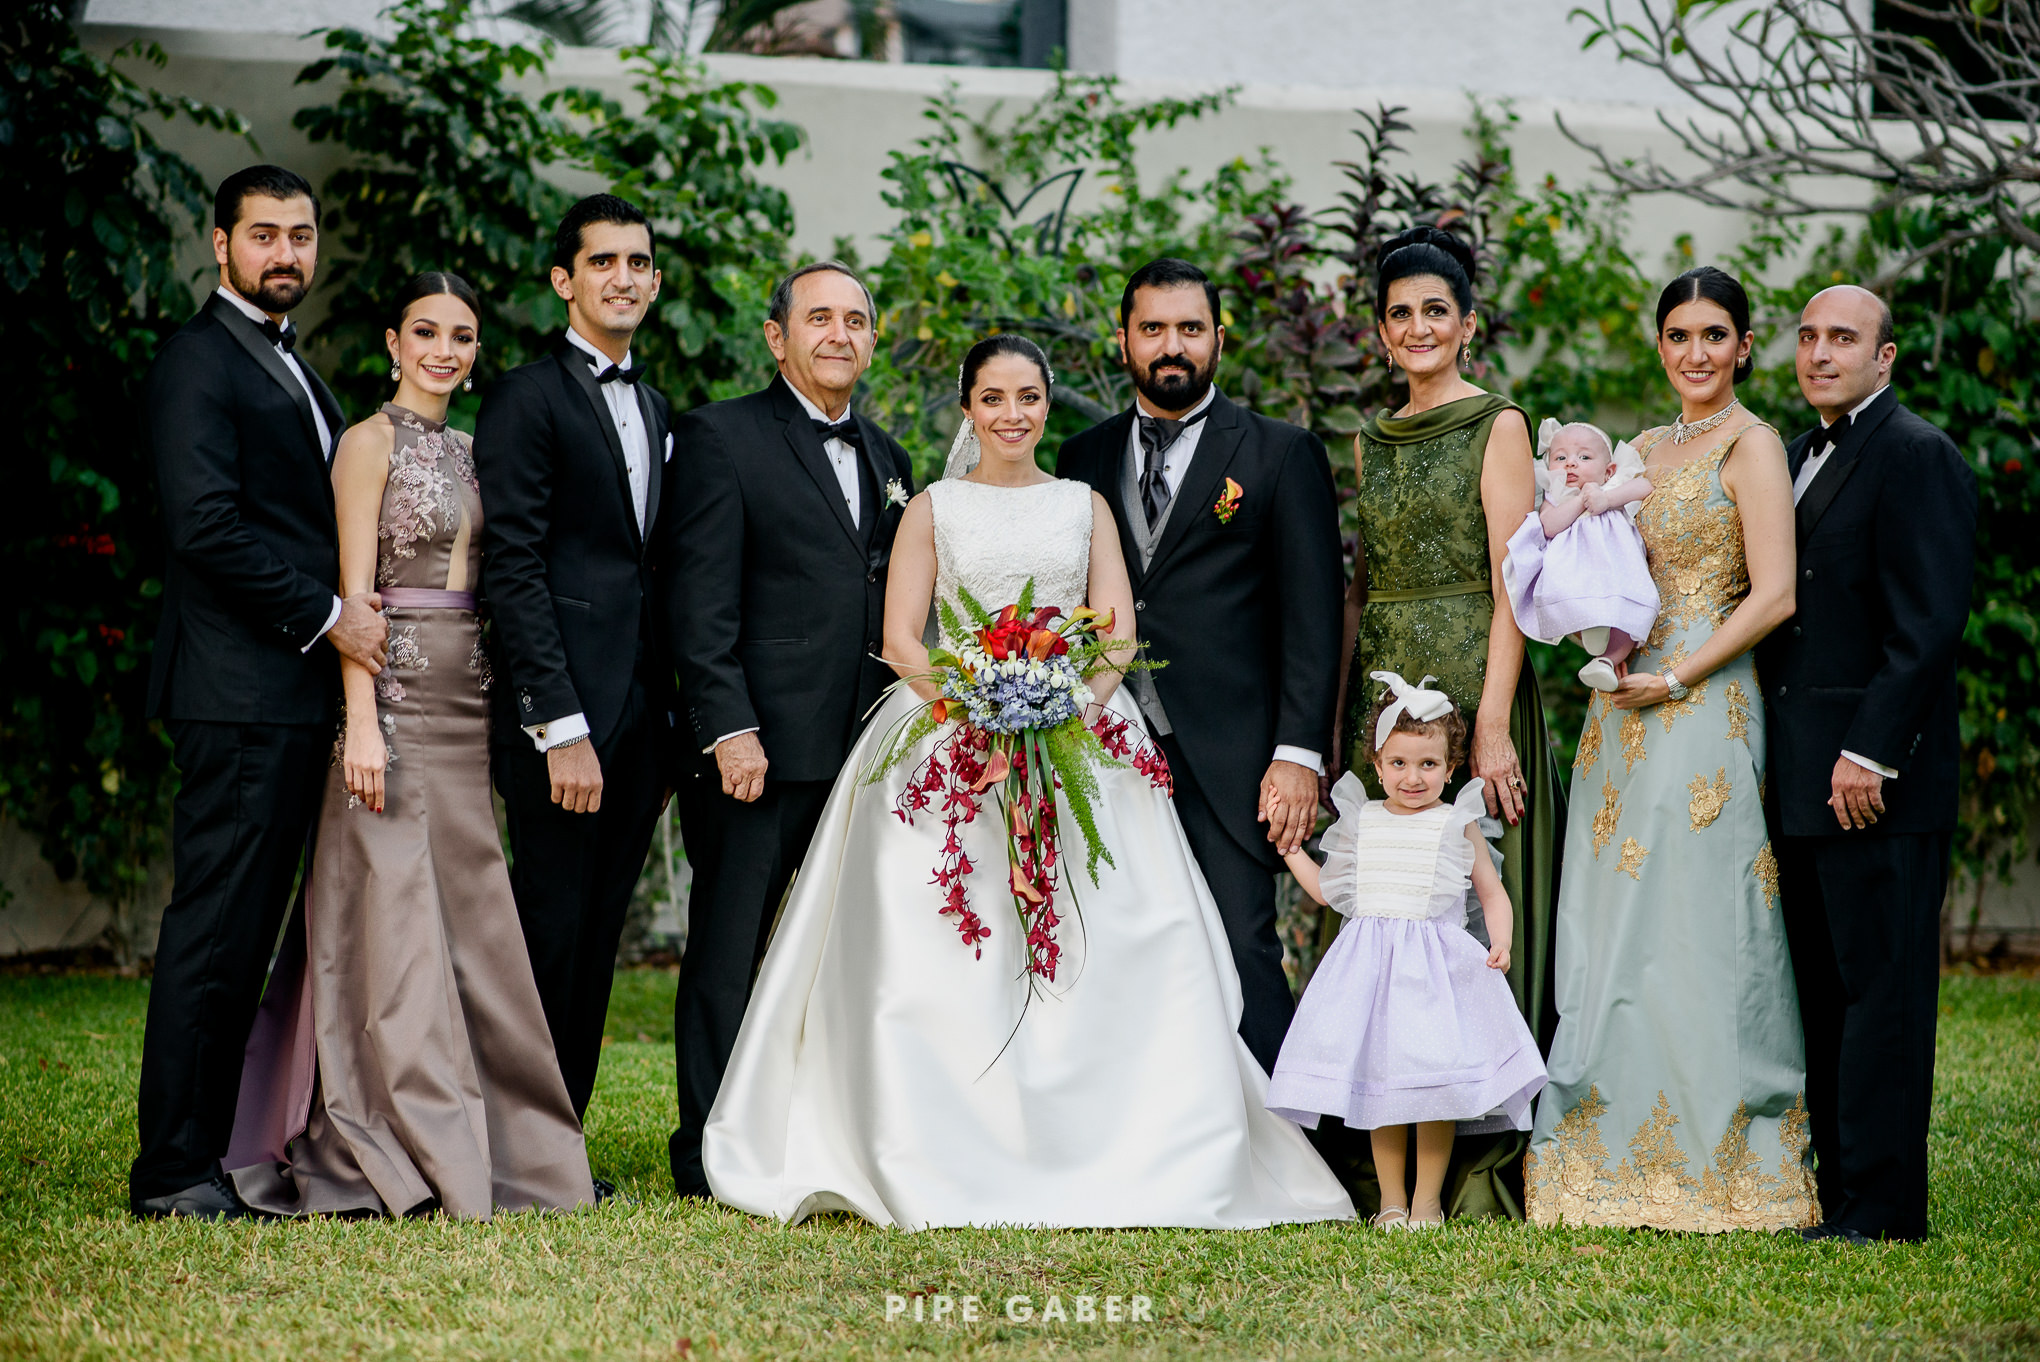 17_02_18_WEDDING_AIDITA_NEZBIT_MIGUEL_DOGRE_152_web.jpg